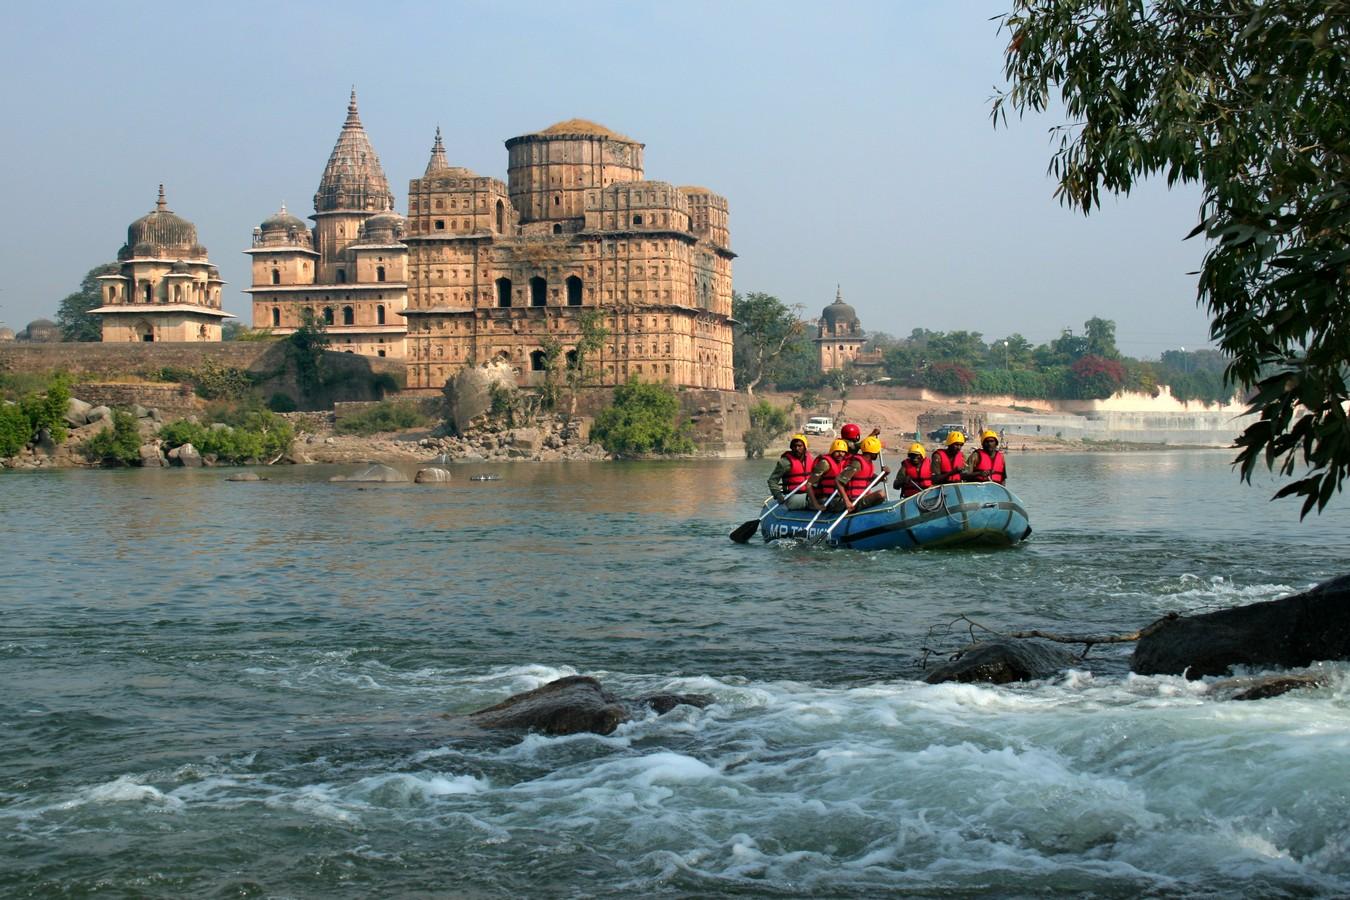 Rafting on the Betwa River, Orchcha, Madhya Pradesh